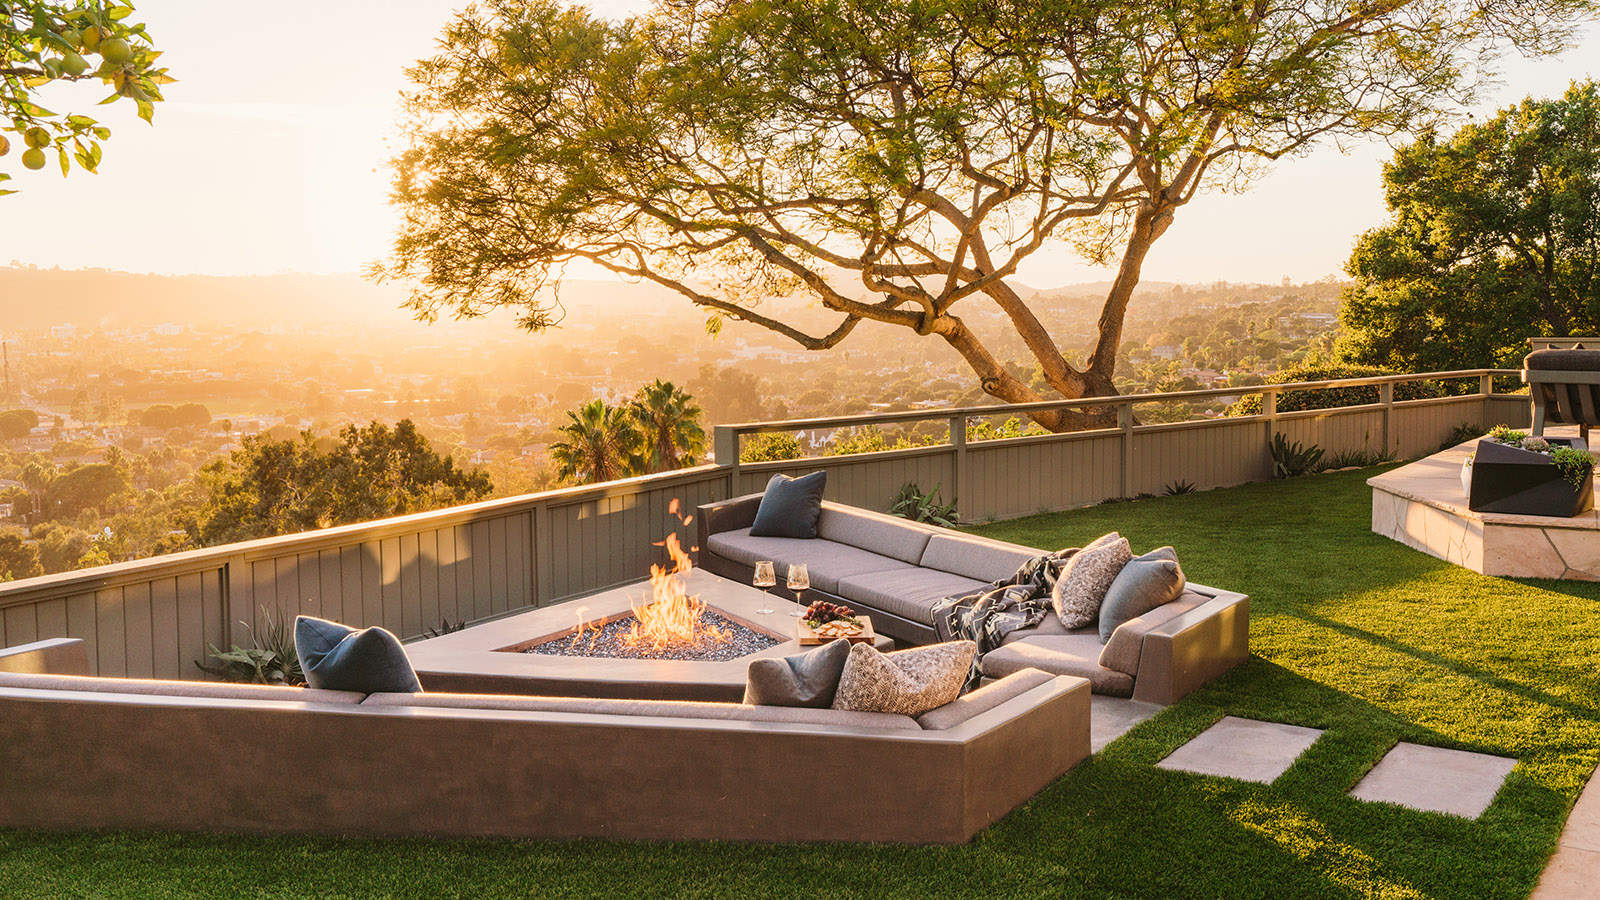 Construction + Design services by EcoLawn Santa Barbara